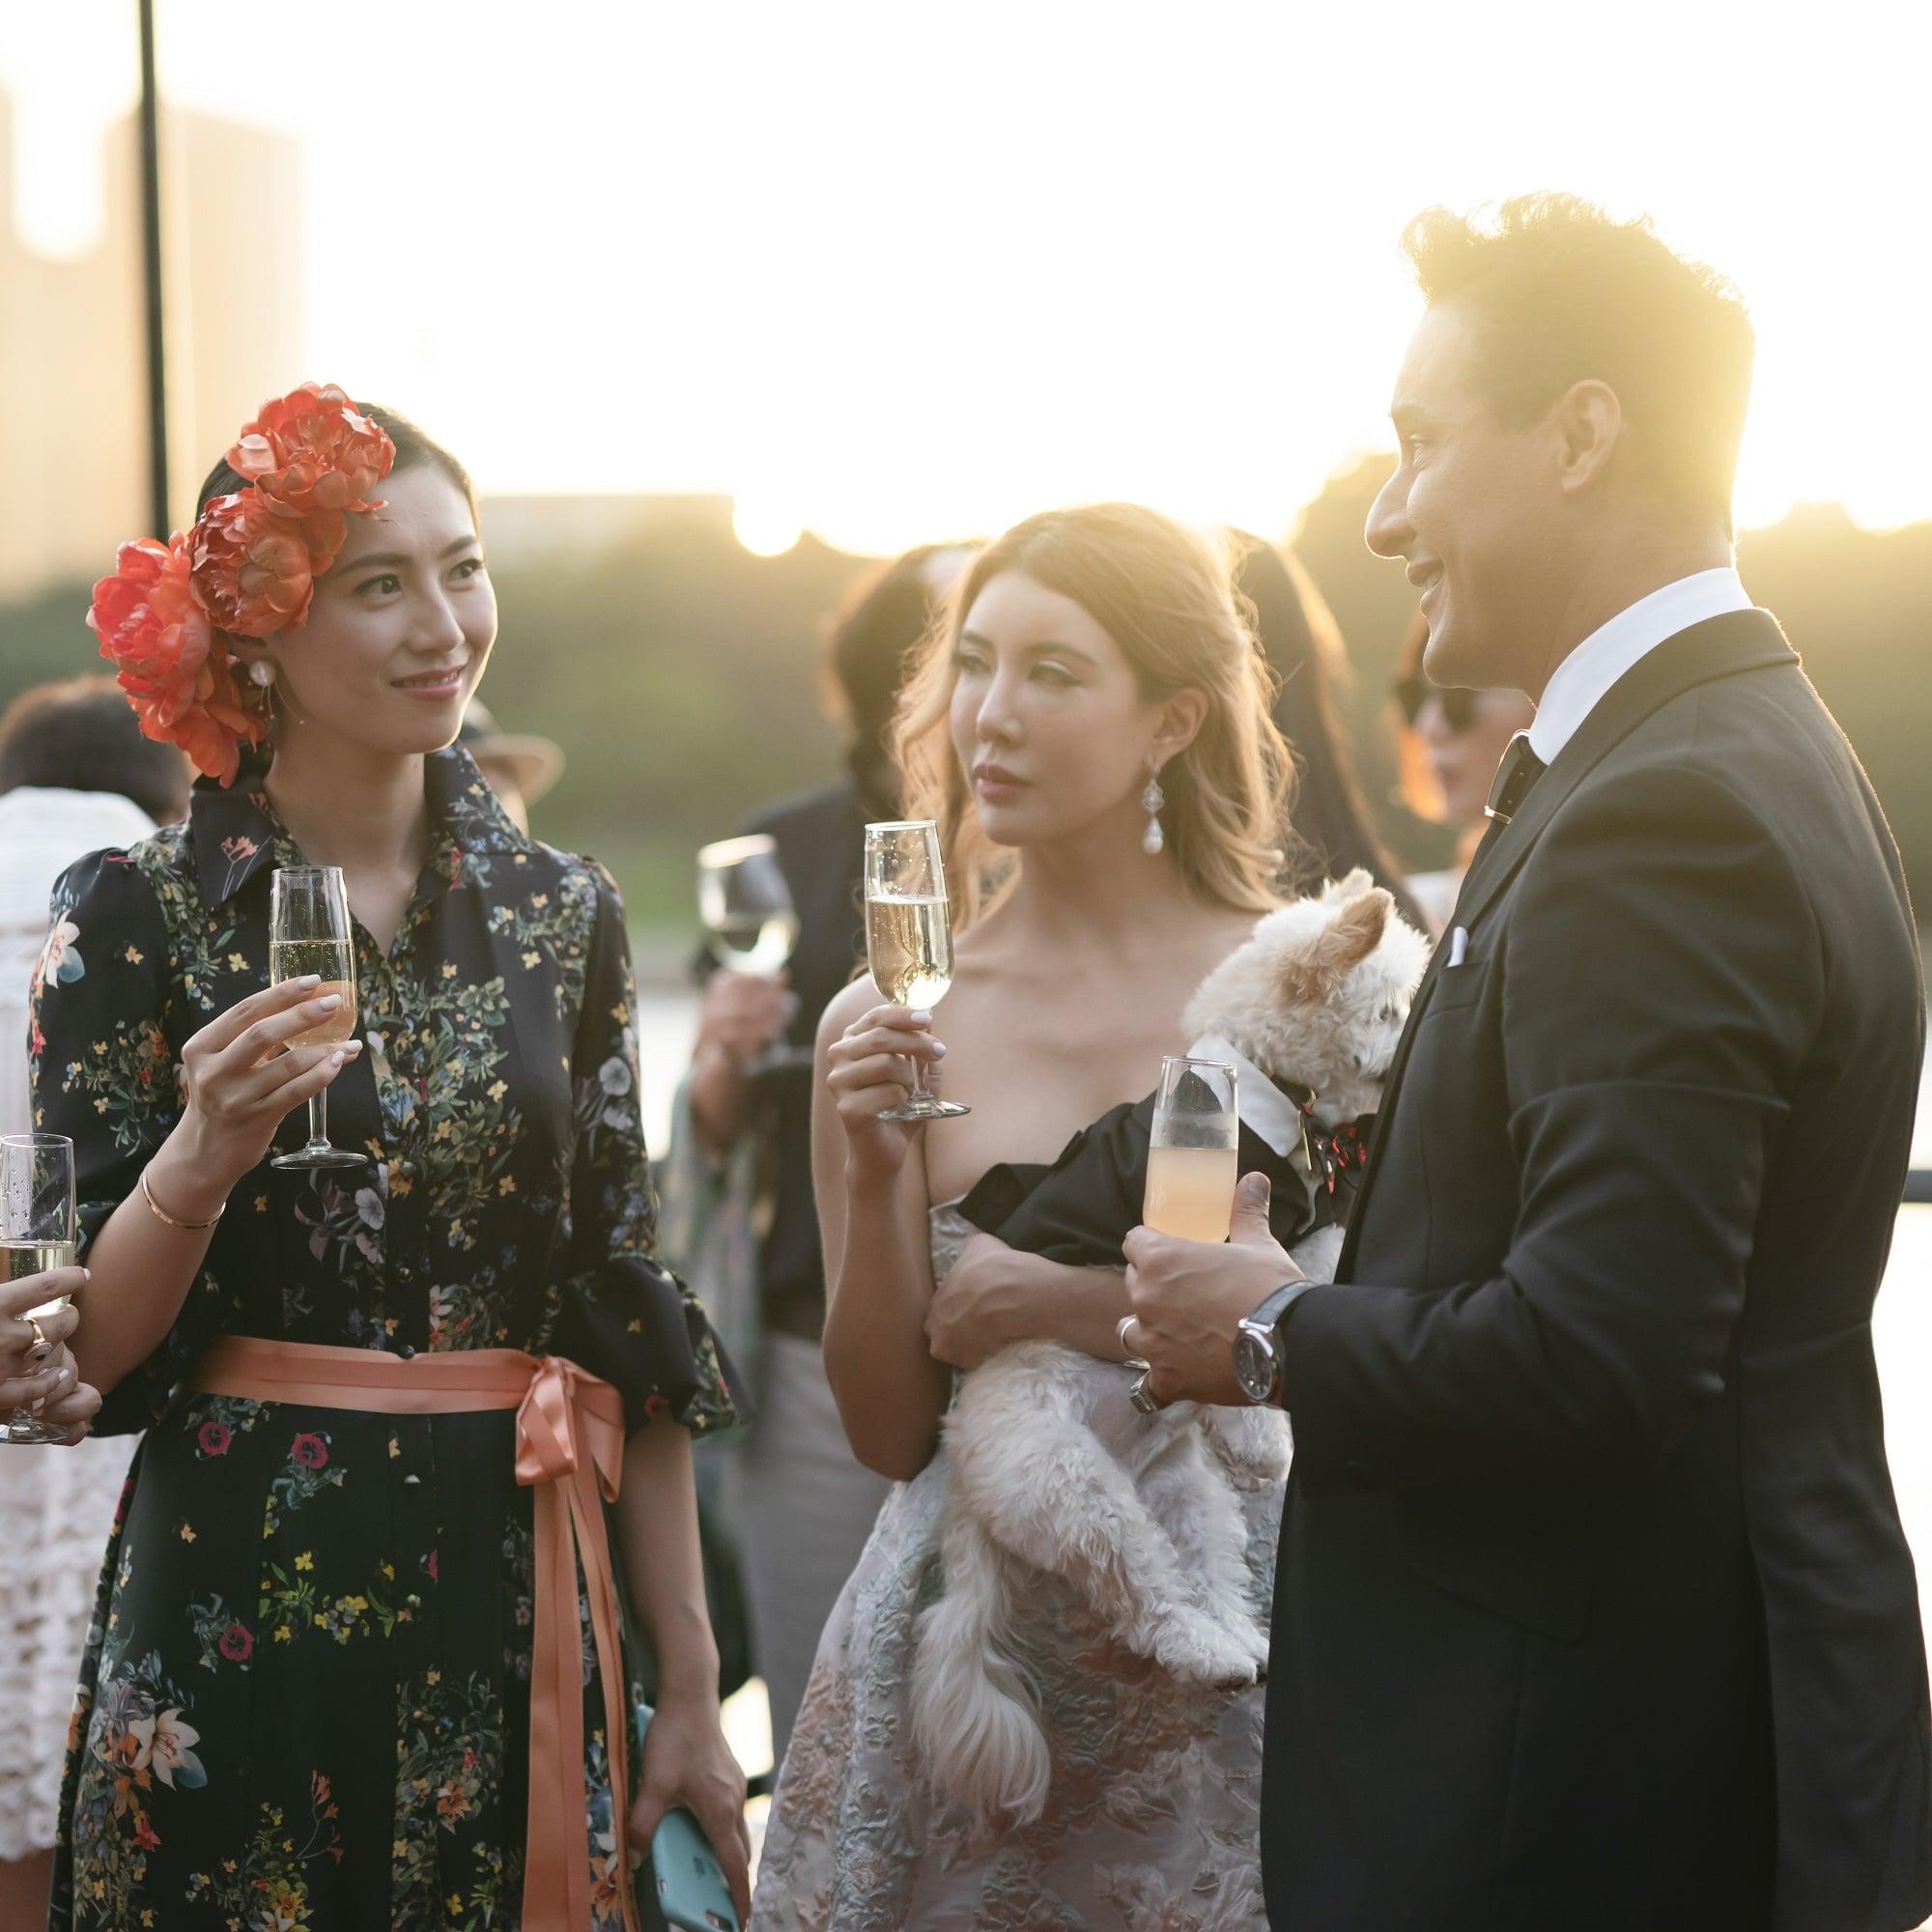 Sydney S Crazy Rich Asians Cast Instagram Accounts Popsugar Celebrity Australia